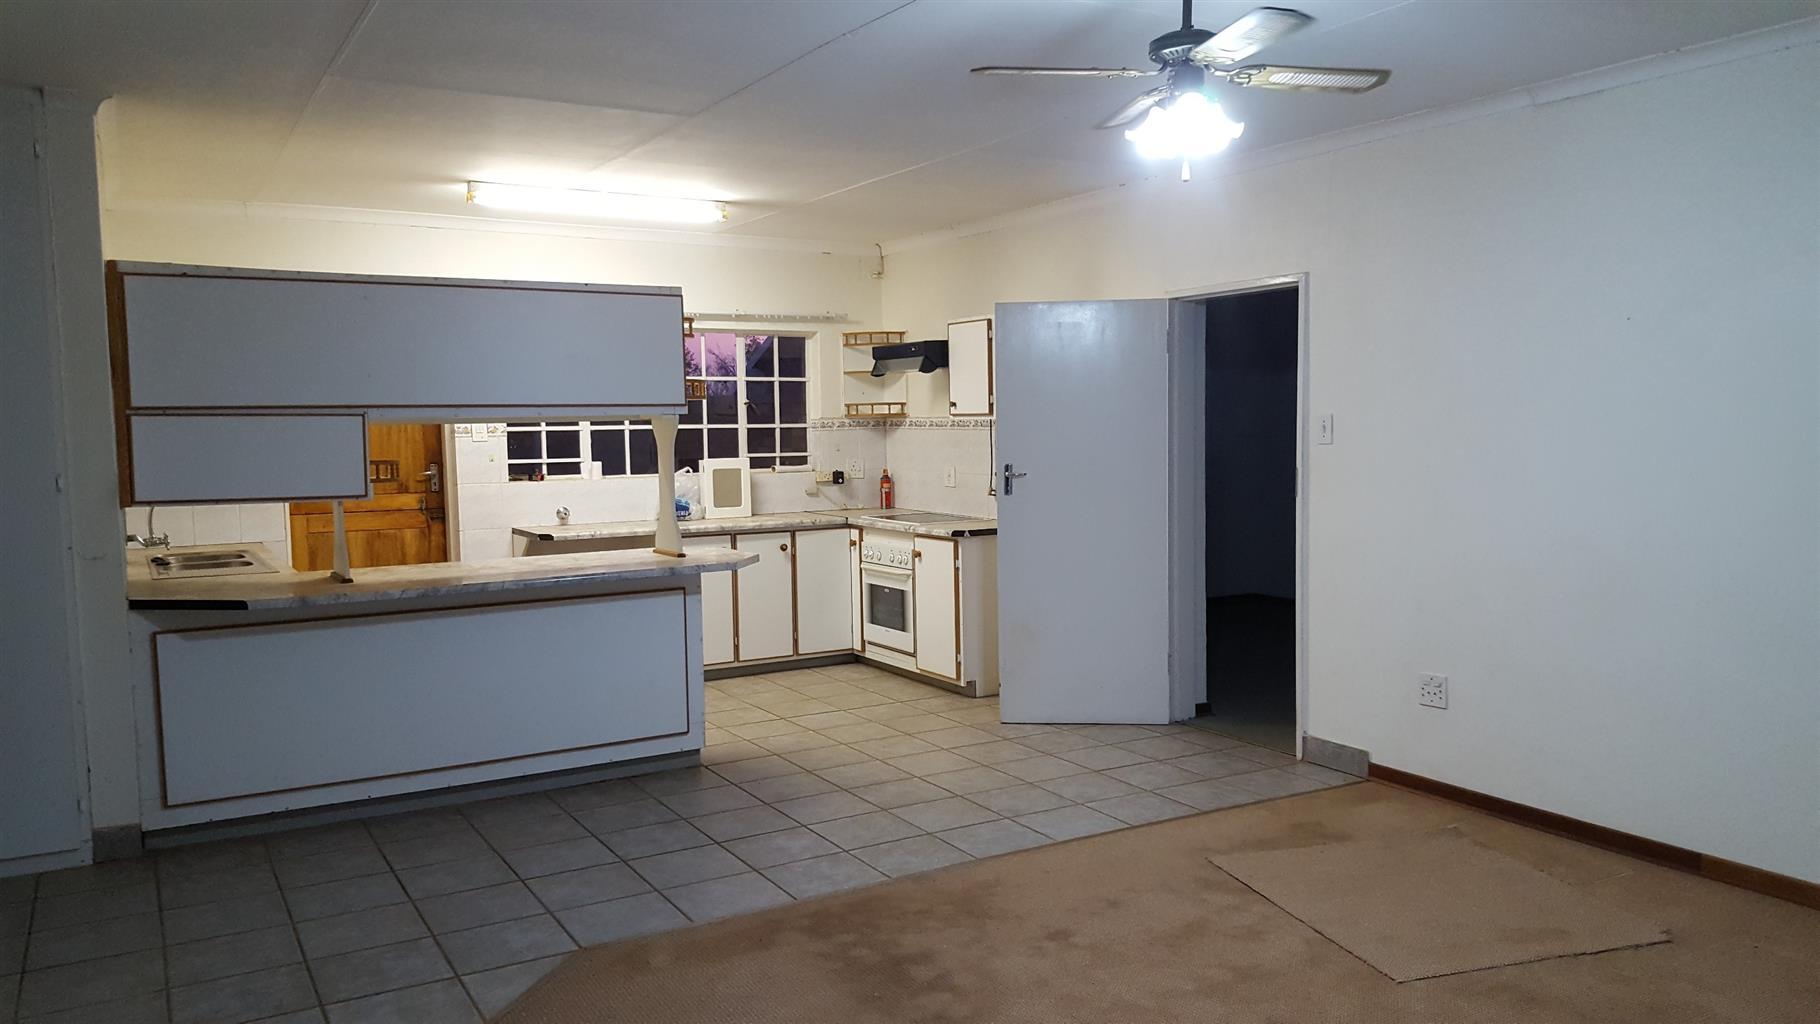 House to rent on Game Farm in Pretoria